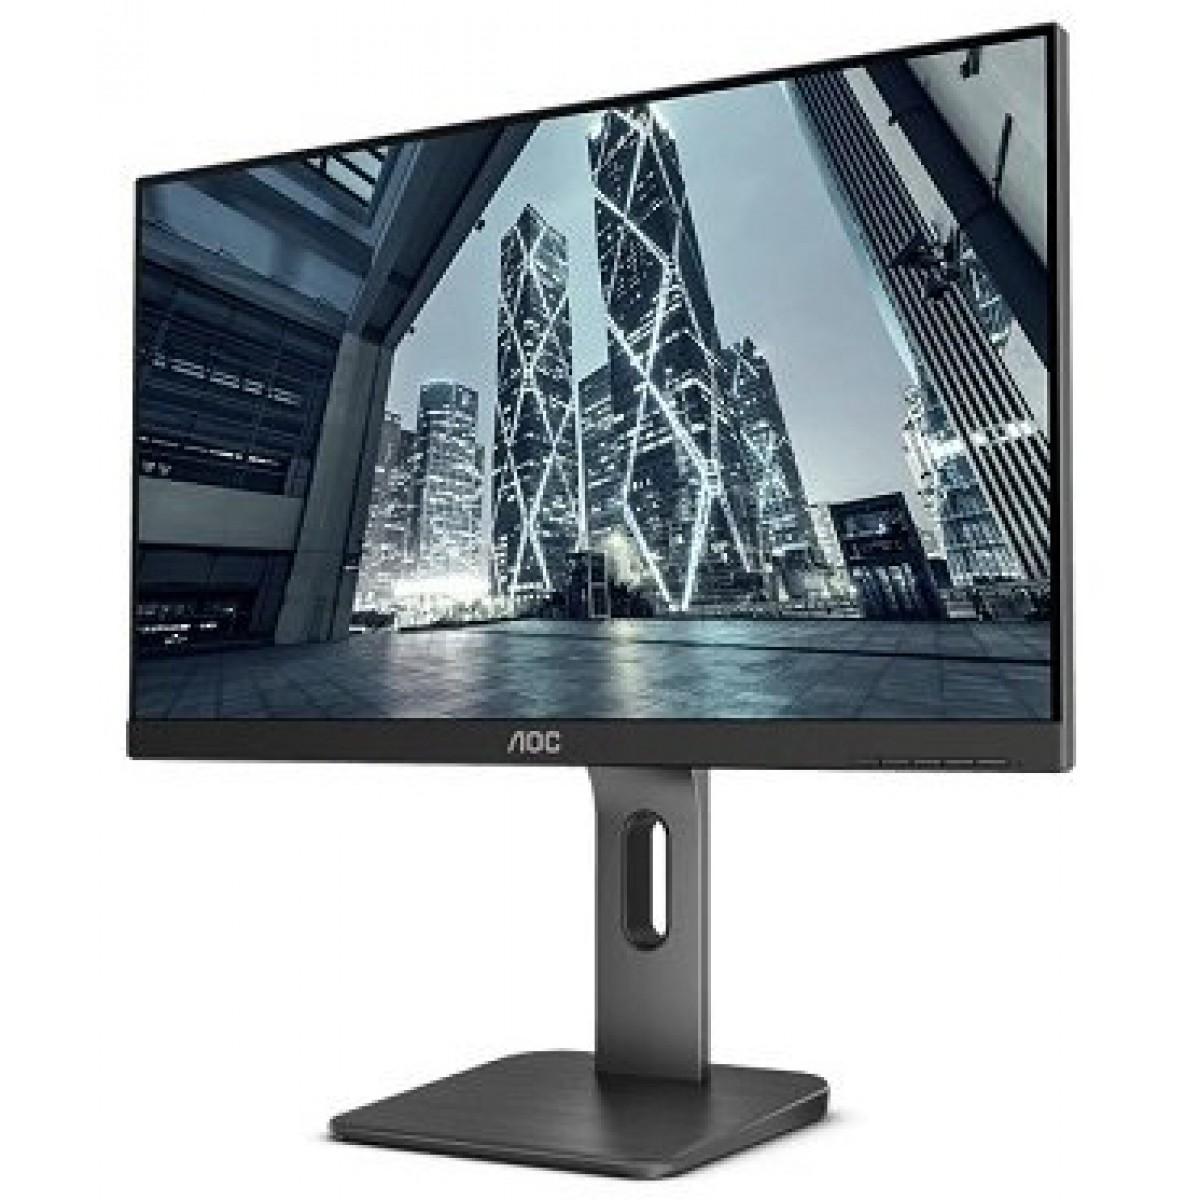 Monitor Gamer AOC 23.8 Pol, Full HD, VGA-HDMI, 24P1U